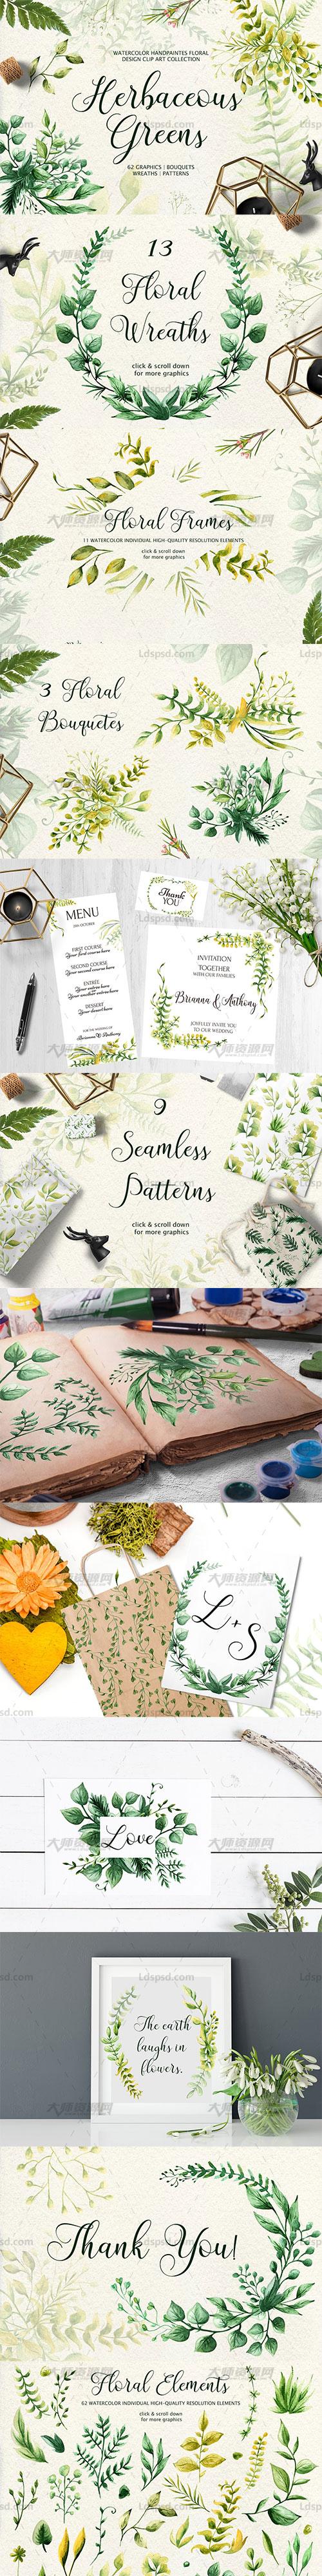 62张正规ag游戏技巧|HOME透明的北欧风水彩草本叶子PNG图片:Herbaceous Greens-watercolor set